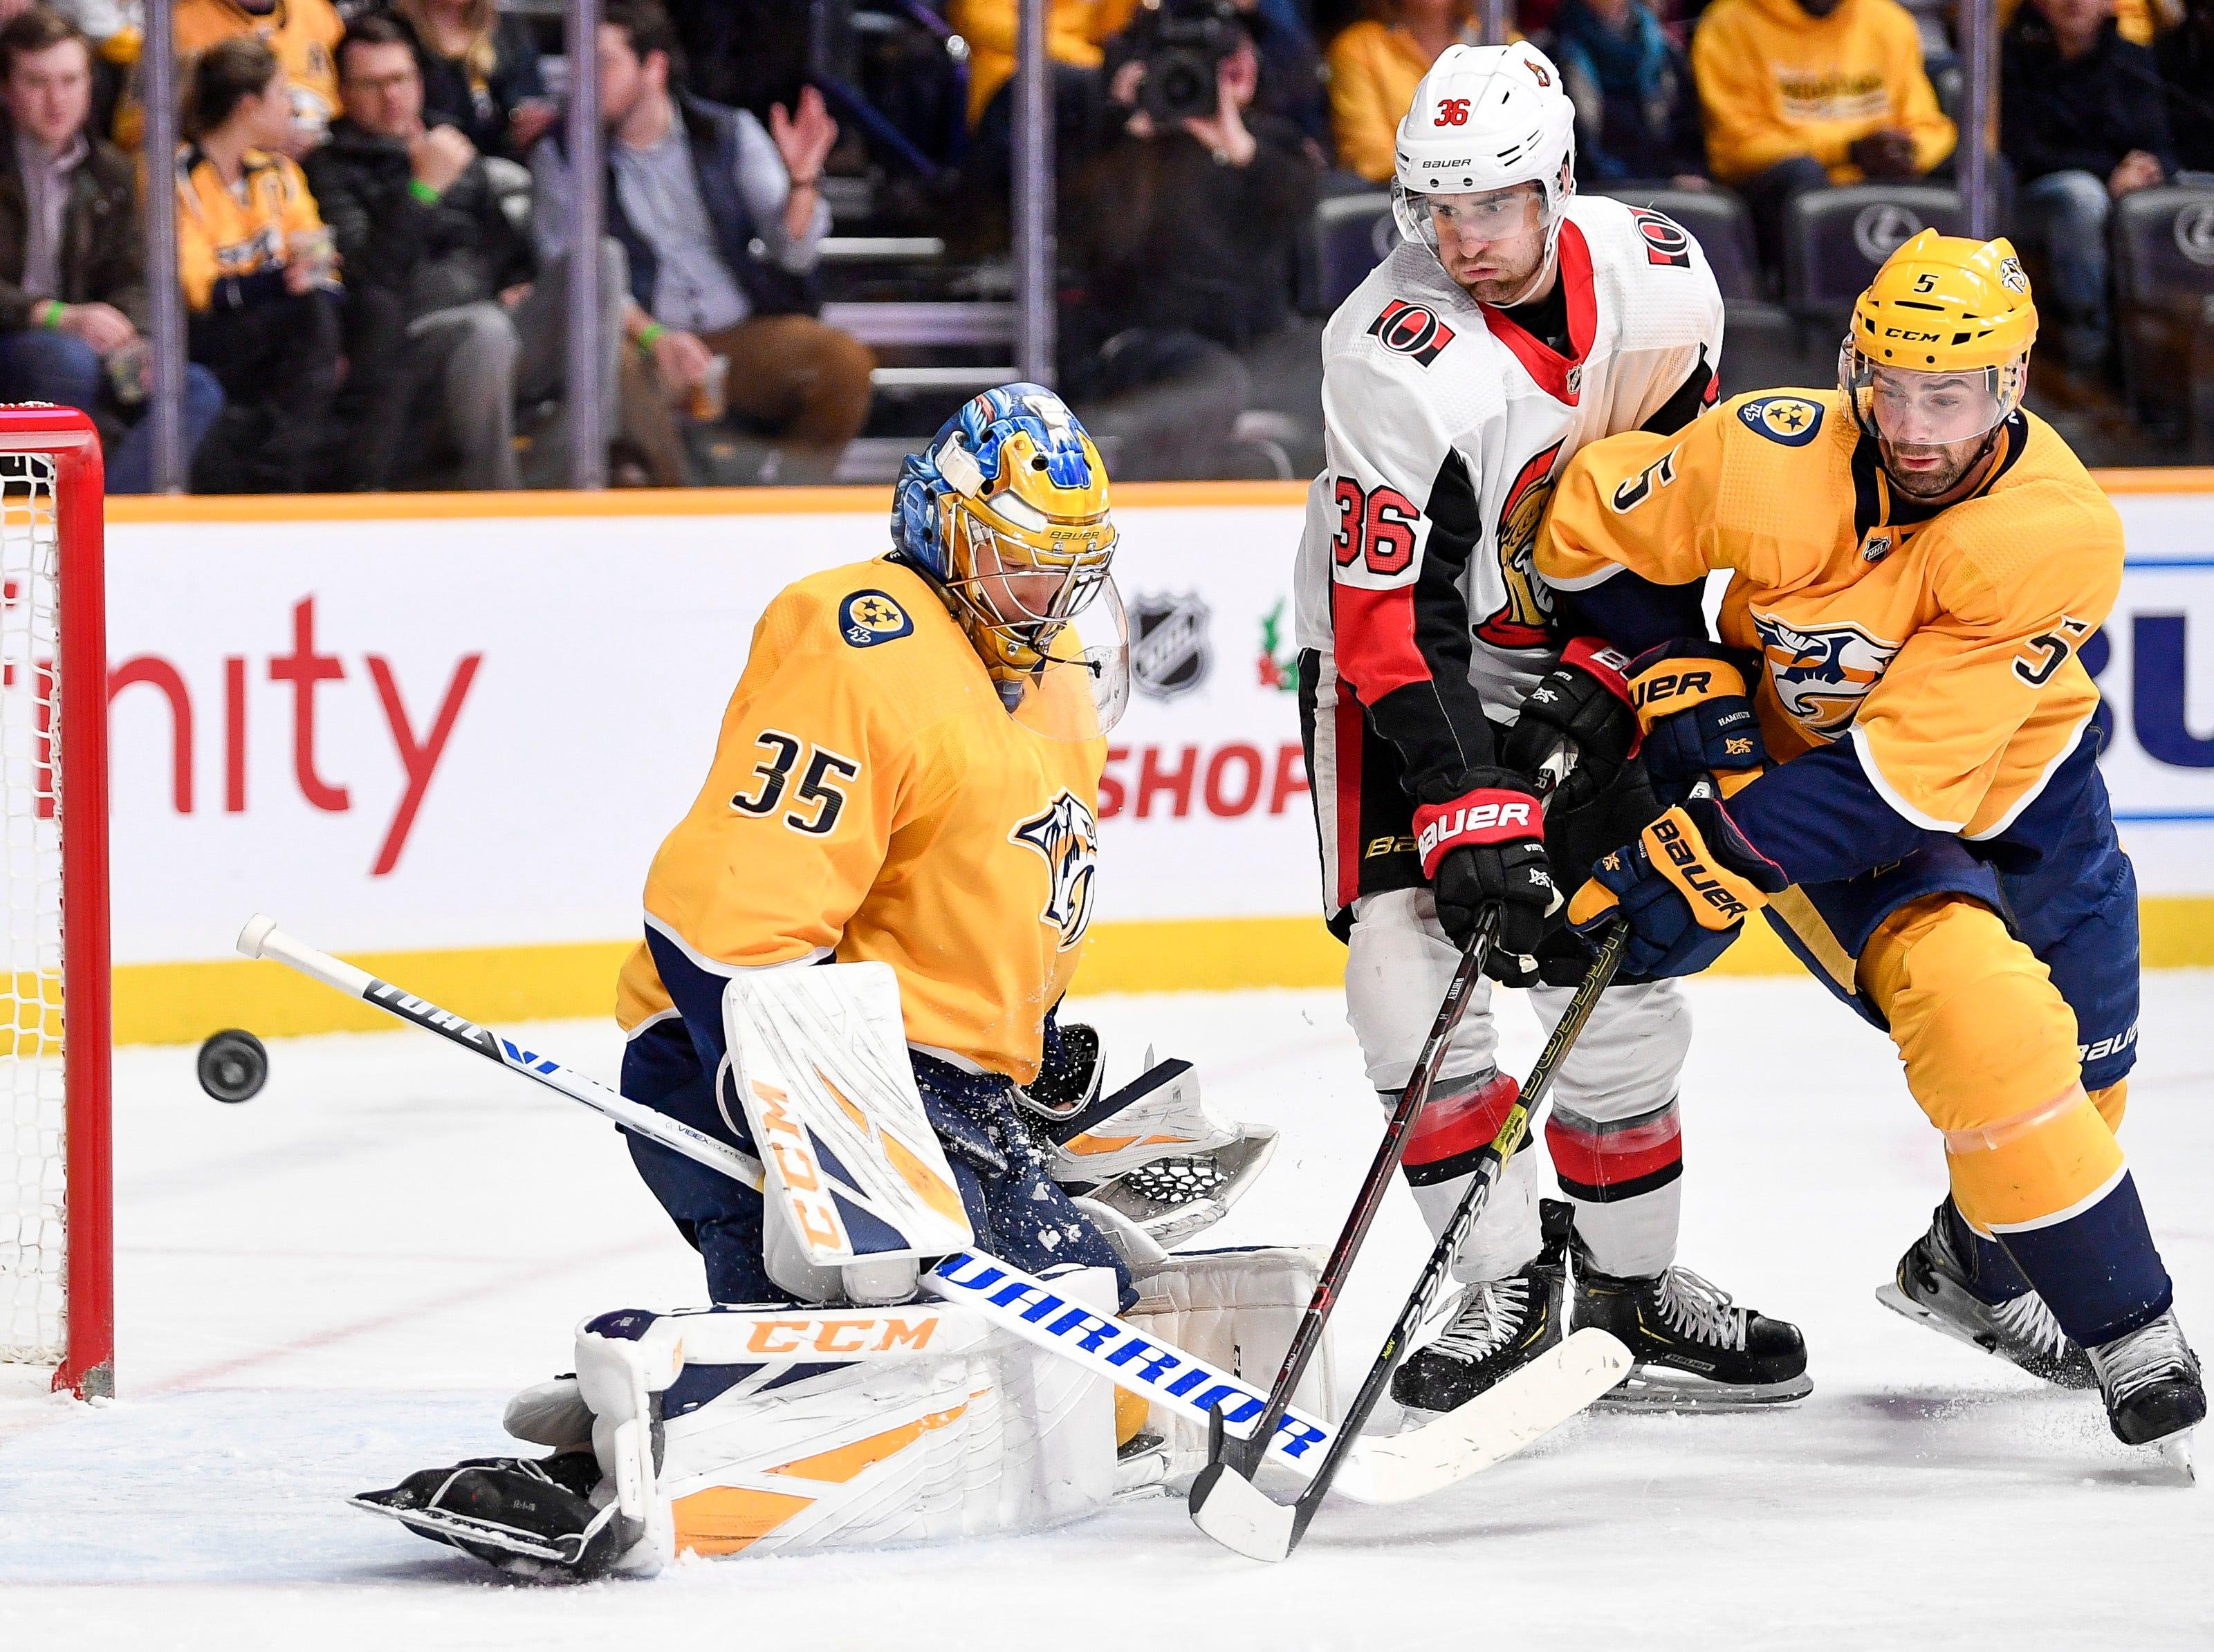 Nashville Predators goaltender Pekka Rinne (35) and defenseman Dan Hamhuis (5) defend against Ottawa Senators center Colin White (36) during the second period at Bridgestone Arena in Nashville, Tenn., Tuesday, Dec. 11, 2018.